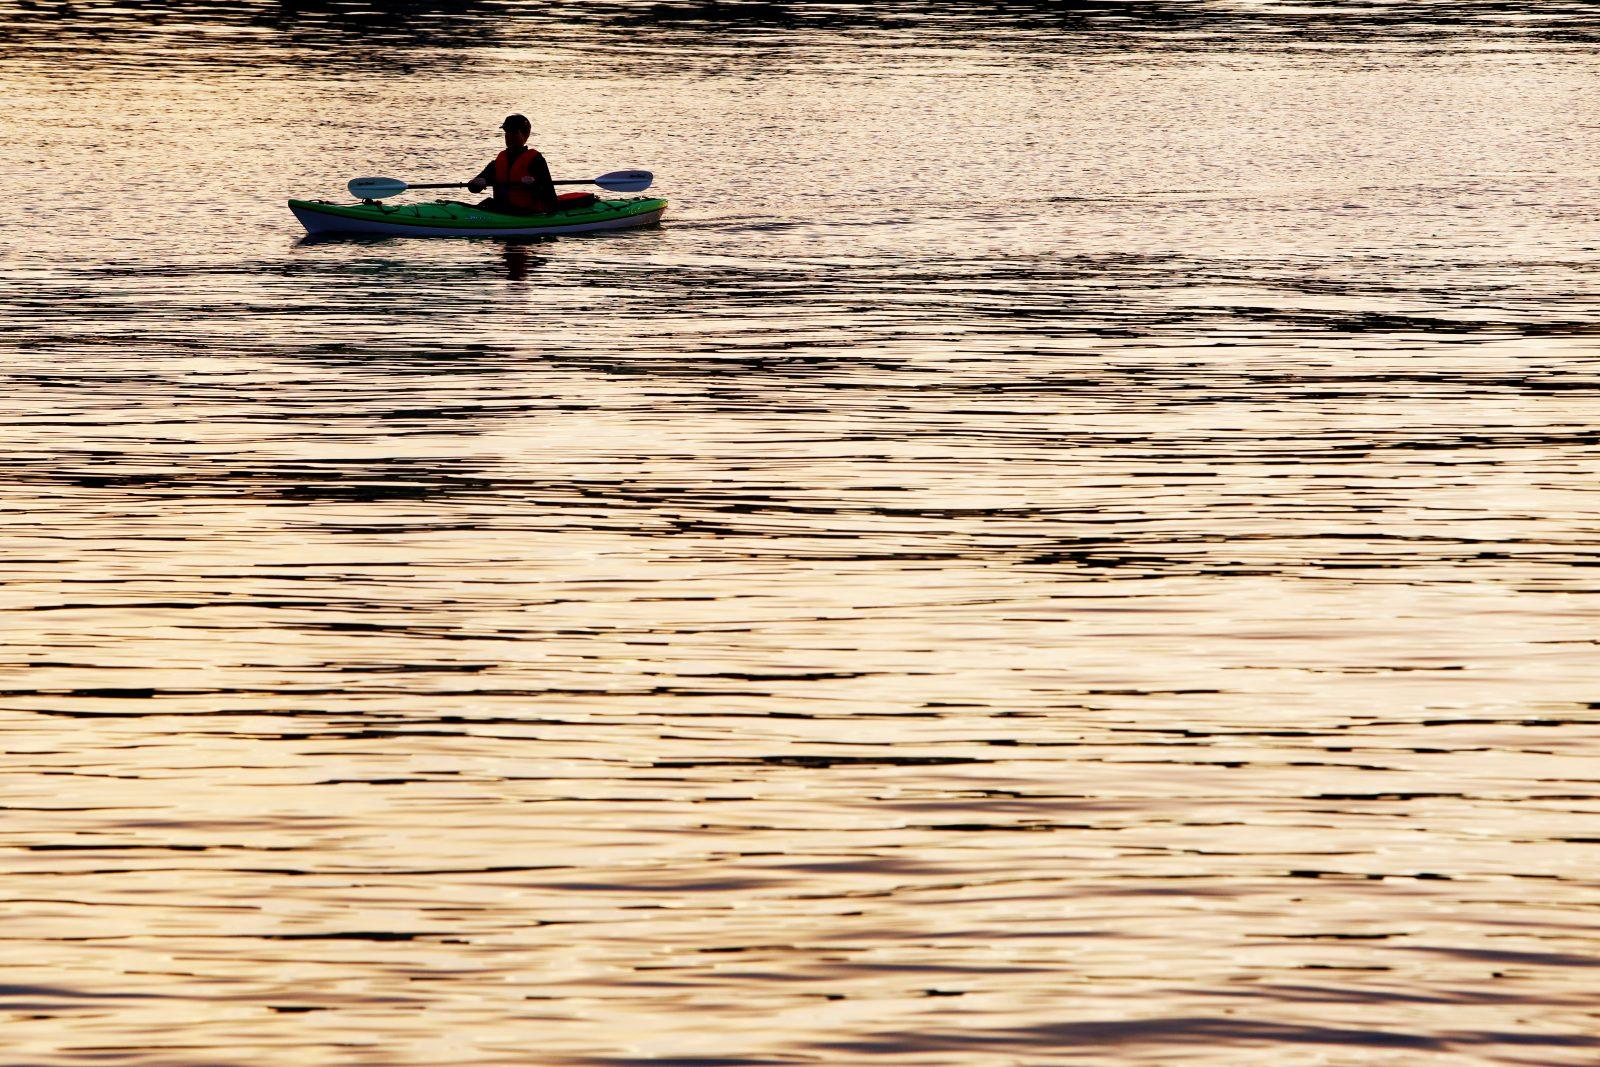 Kayak On Golden River